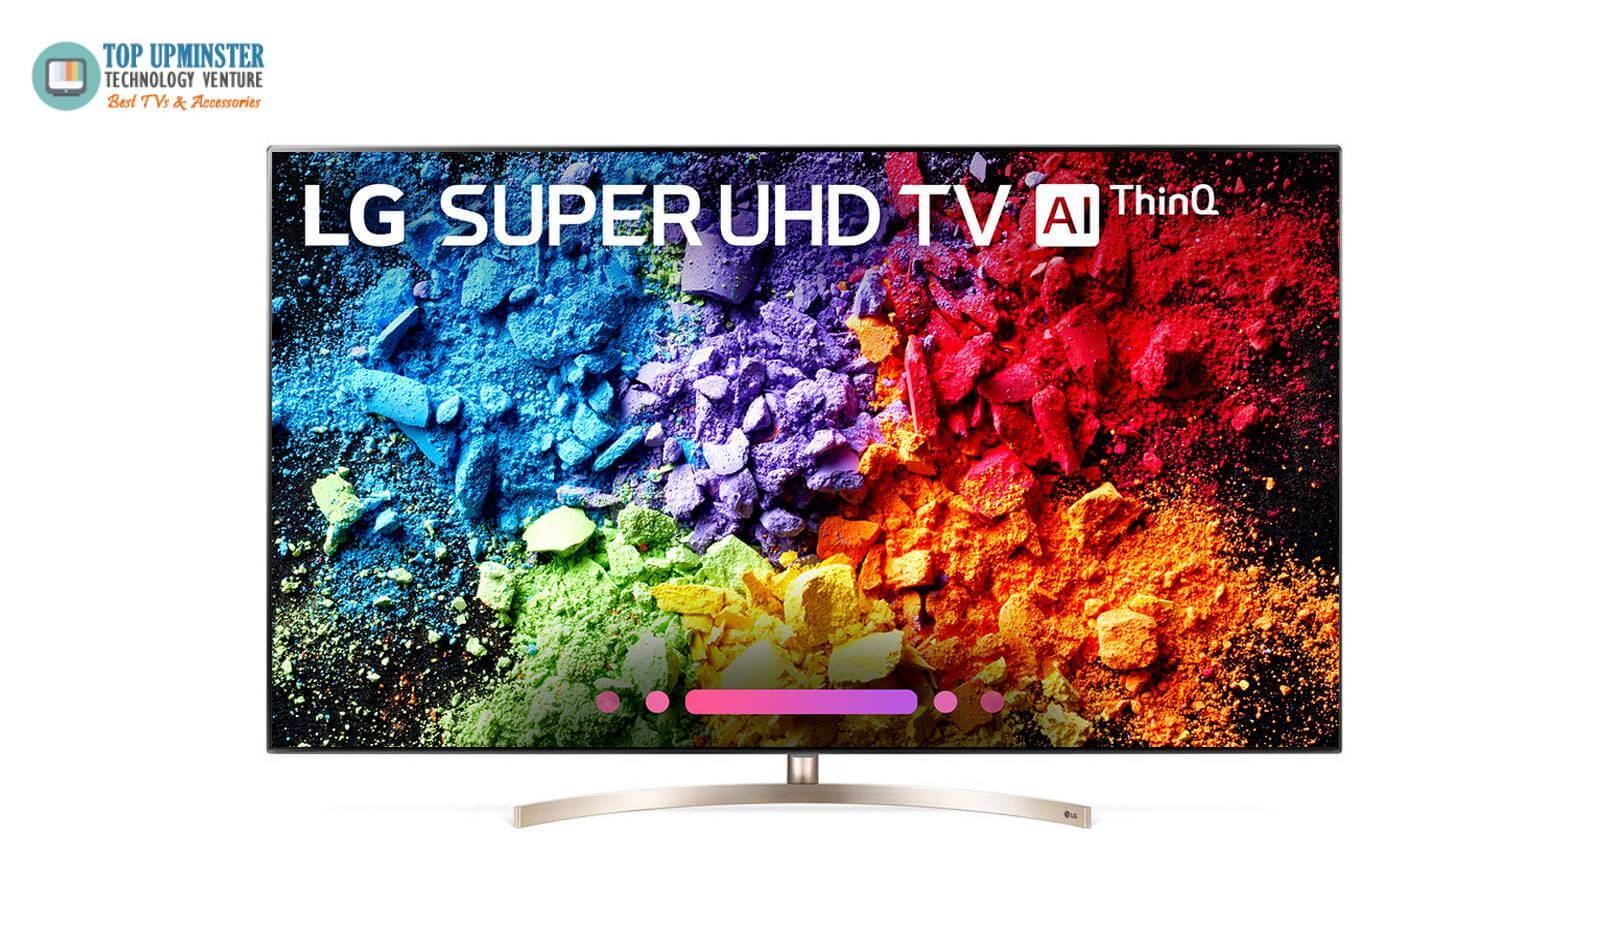 LG Super Ultra HD 4K Smart TV